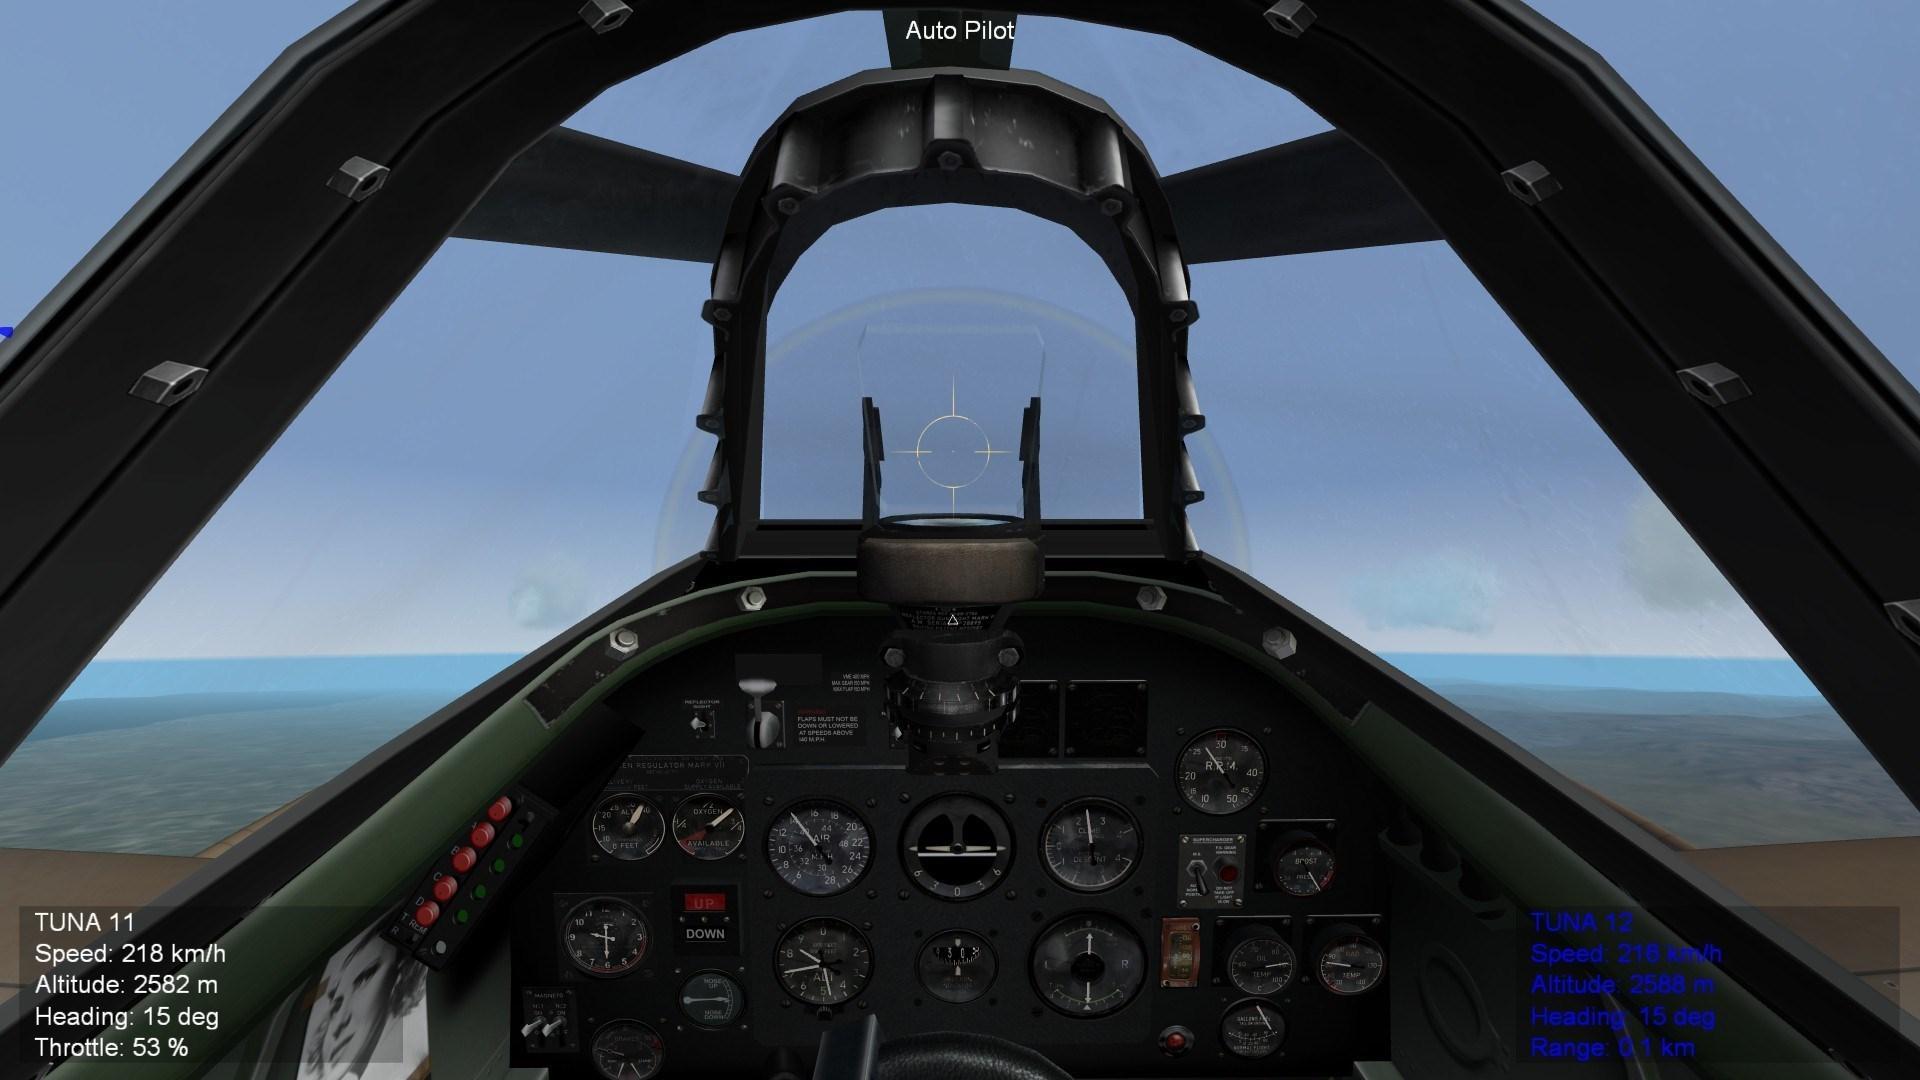 Spitfire 9e Cockpit